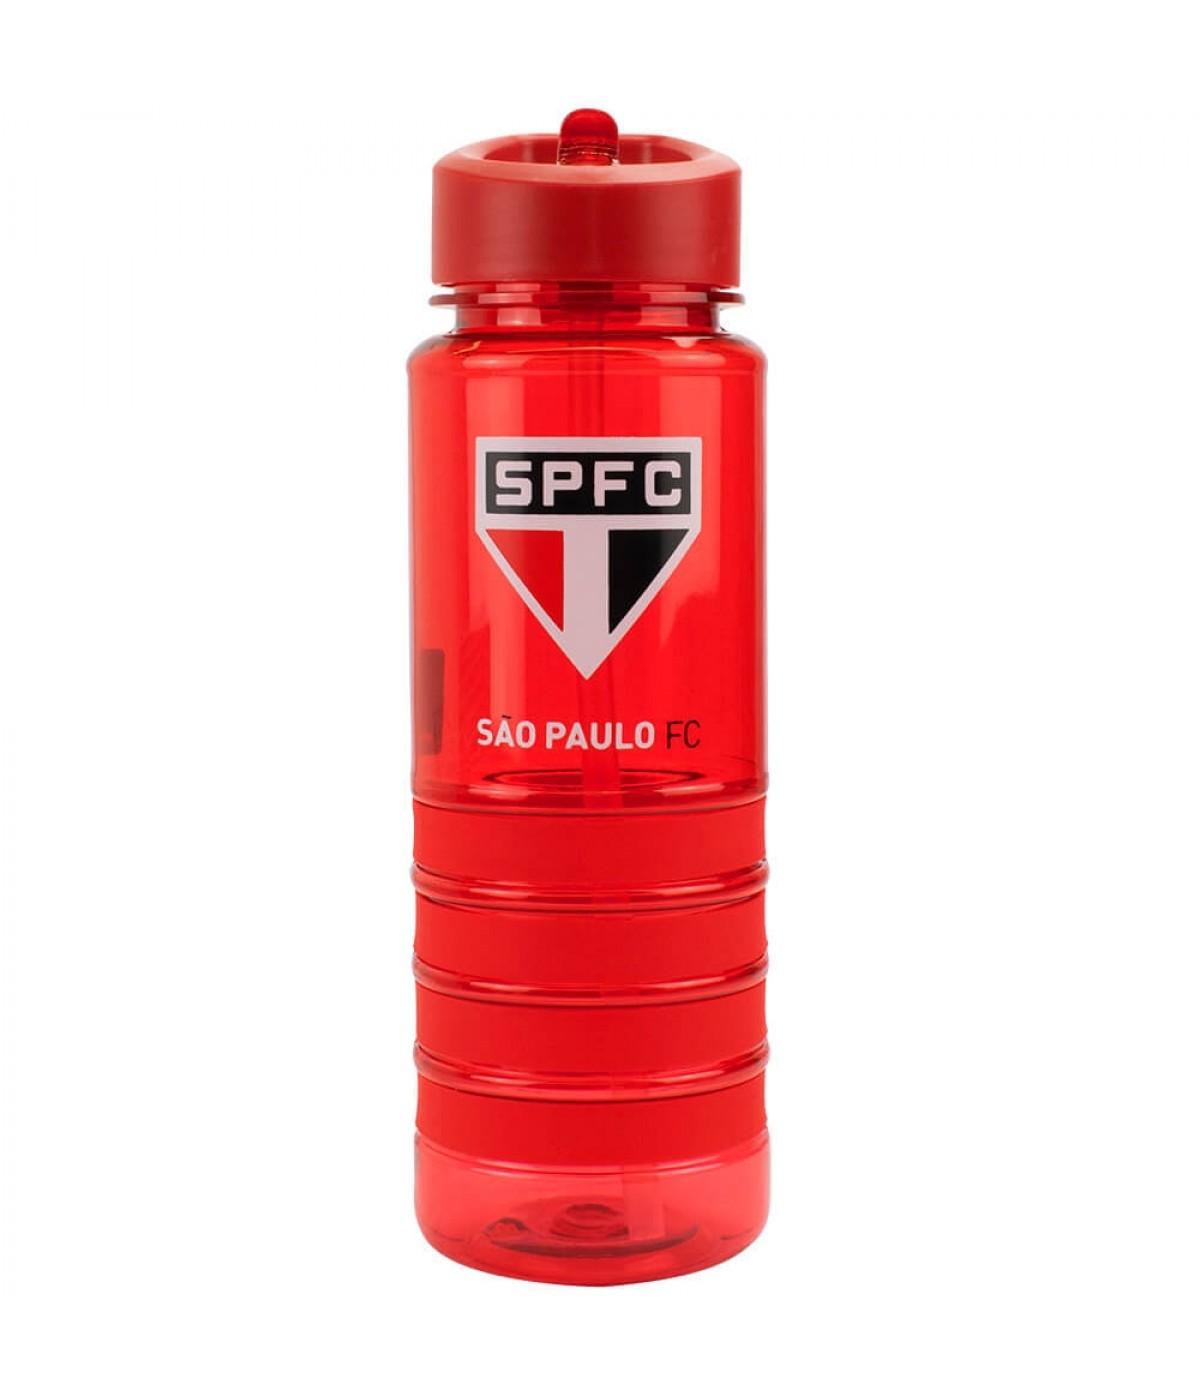 Garrafa Plástico Canudo Retrátil 700ml - SPFC